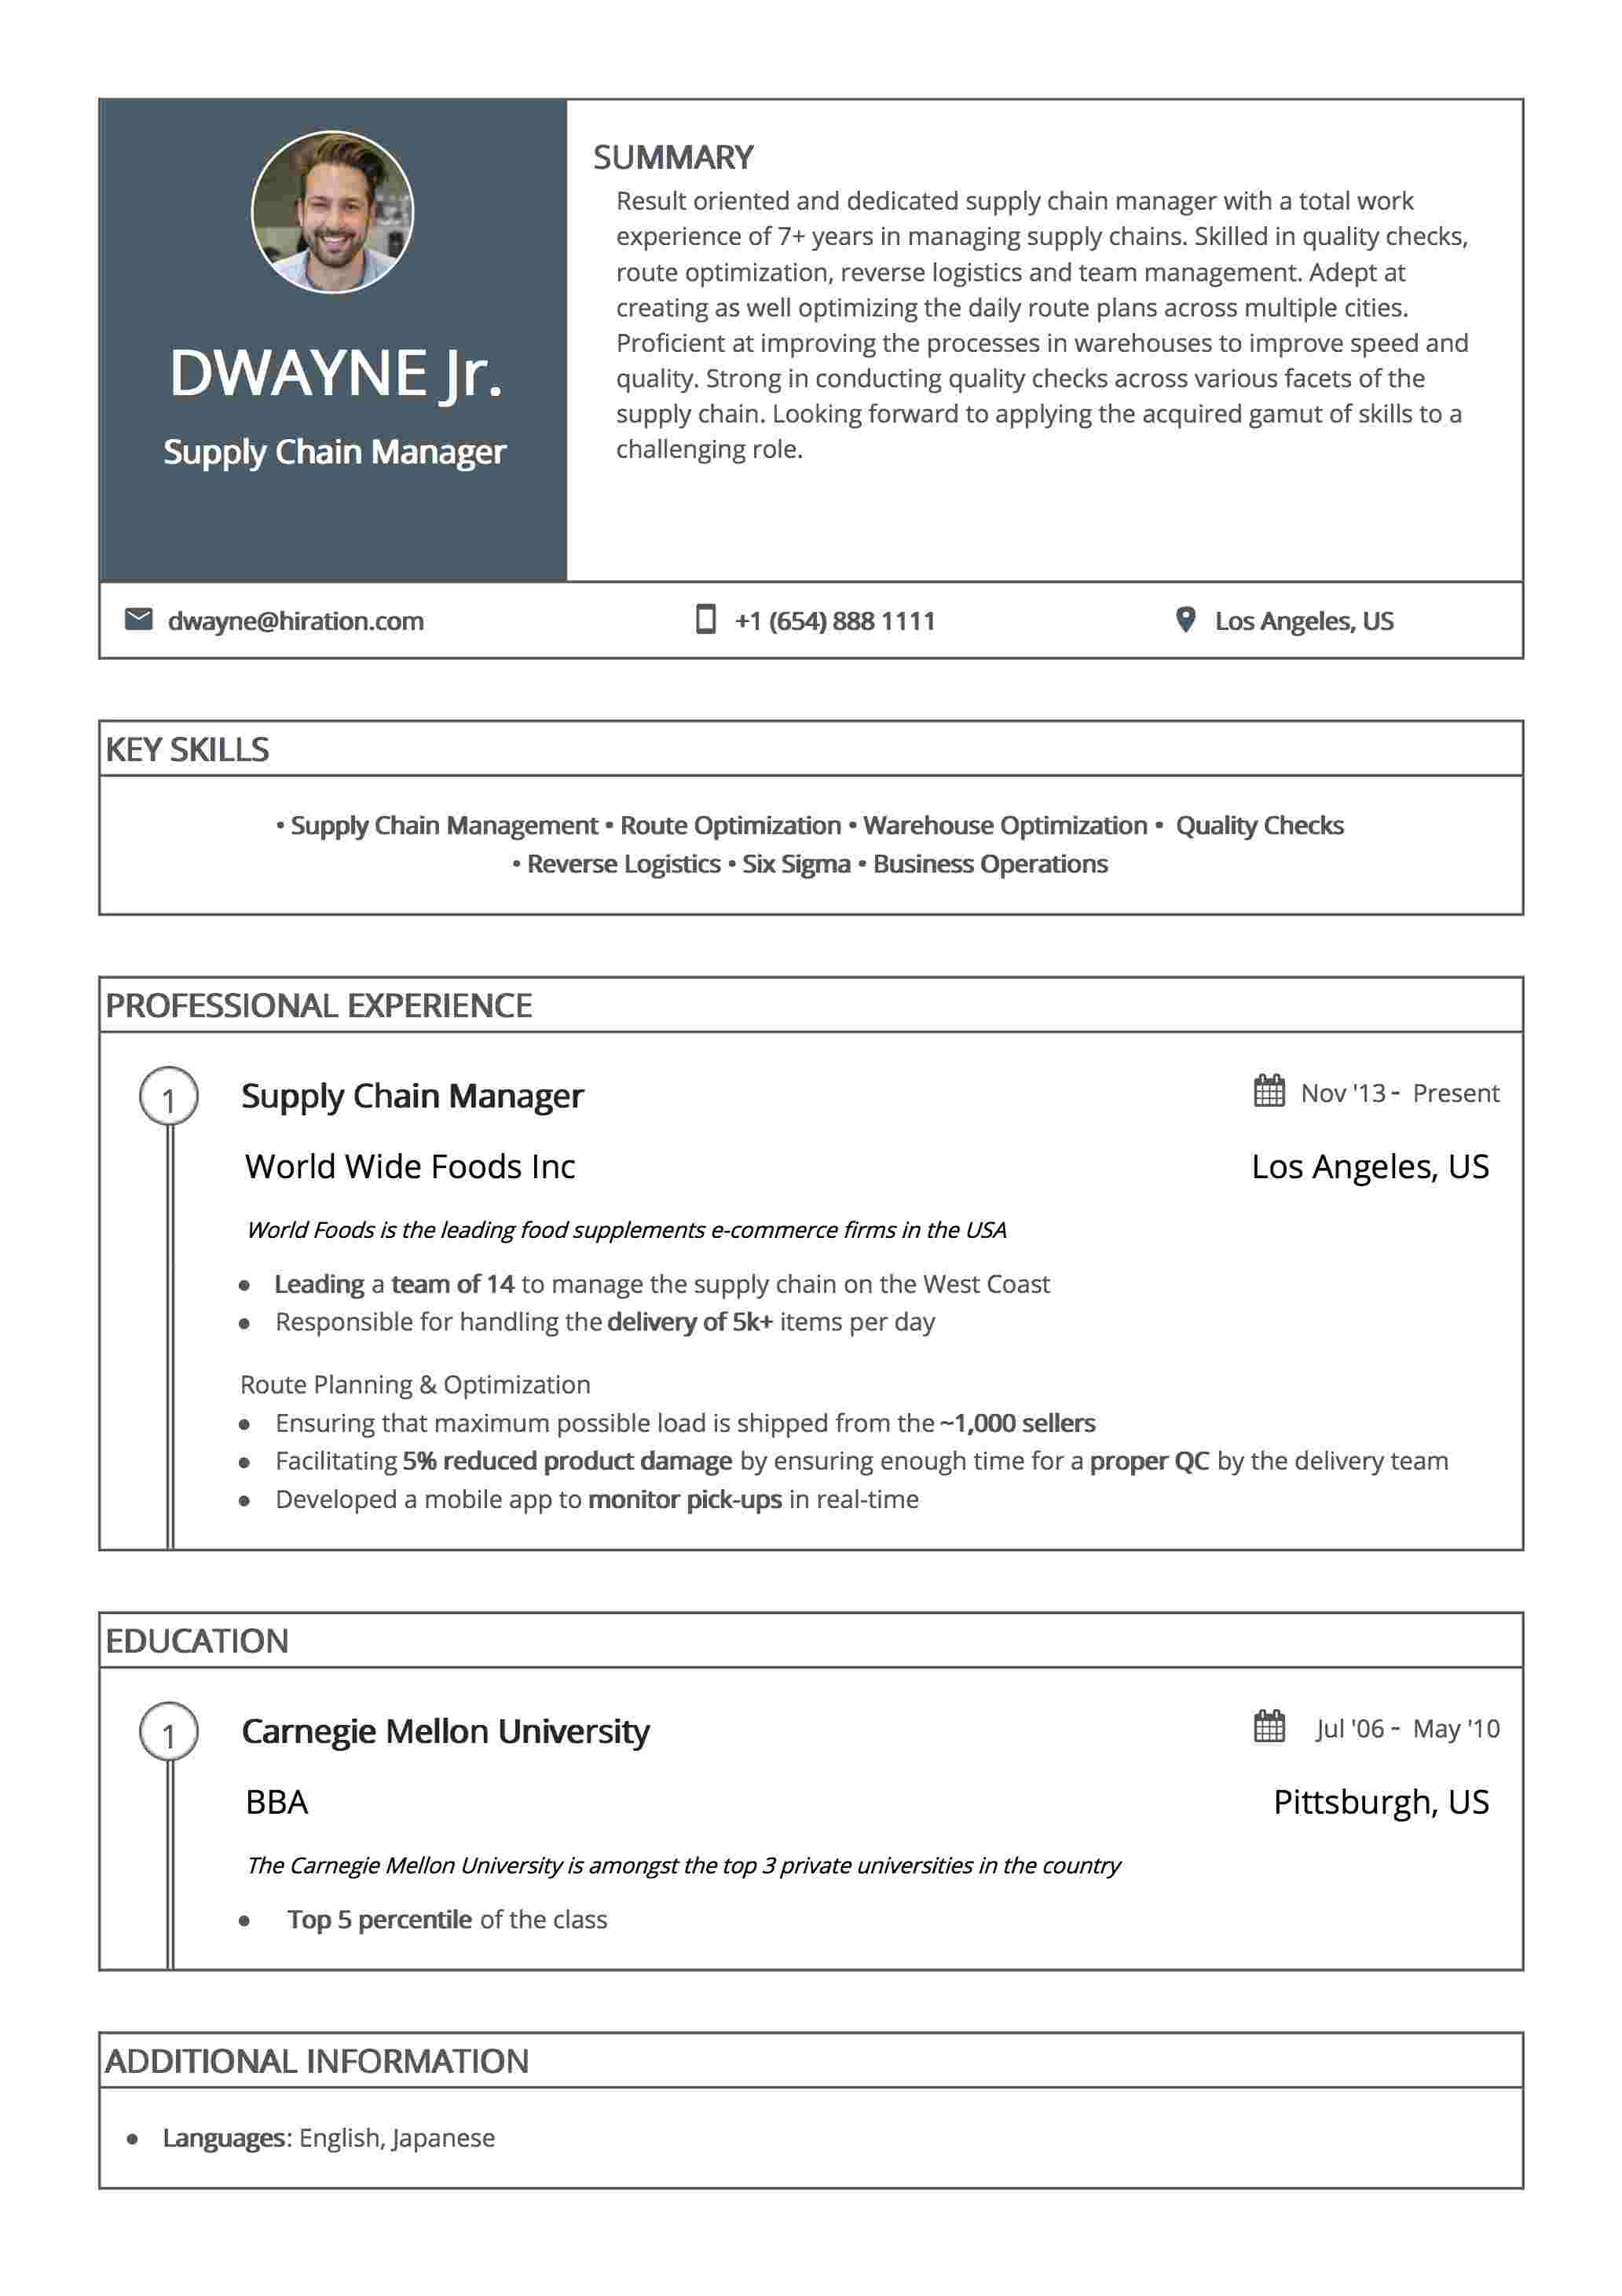 Resume Template: New York